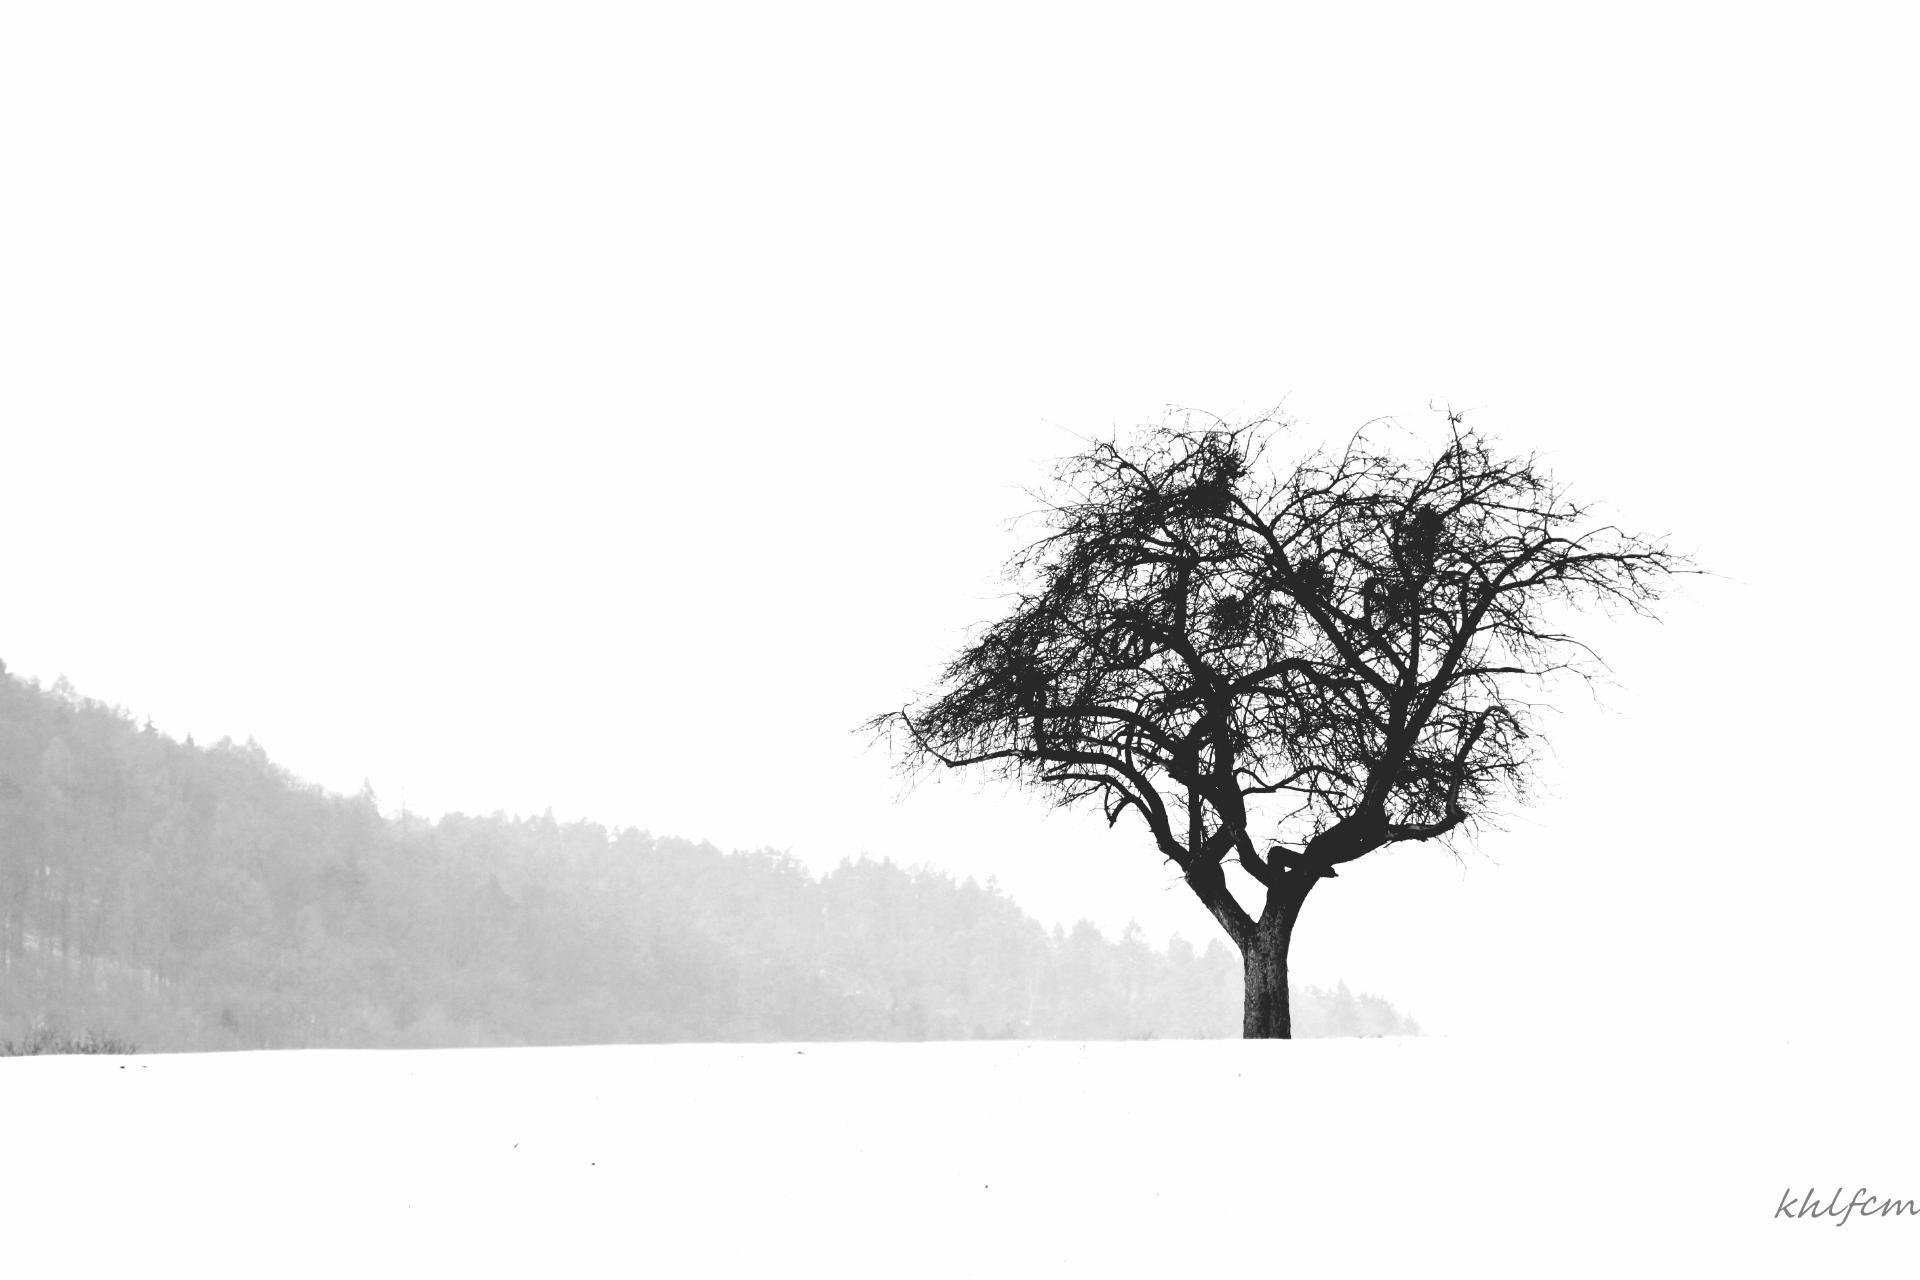 Karl-Heinz Link, Baum Winter